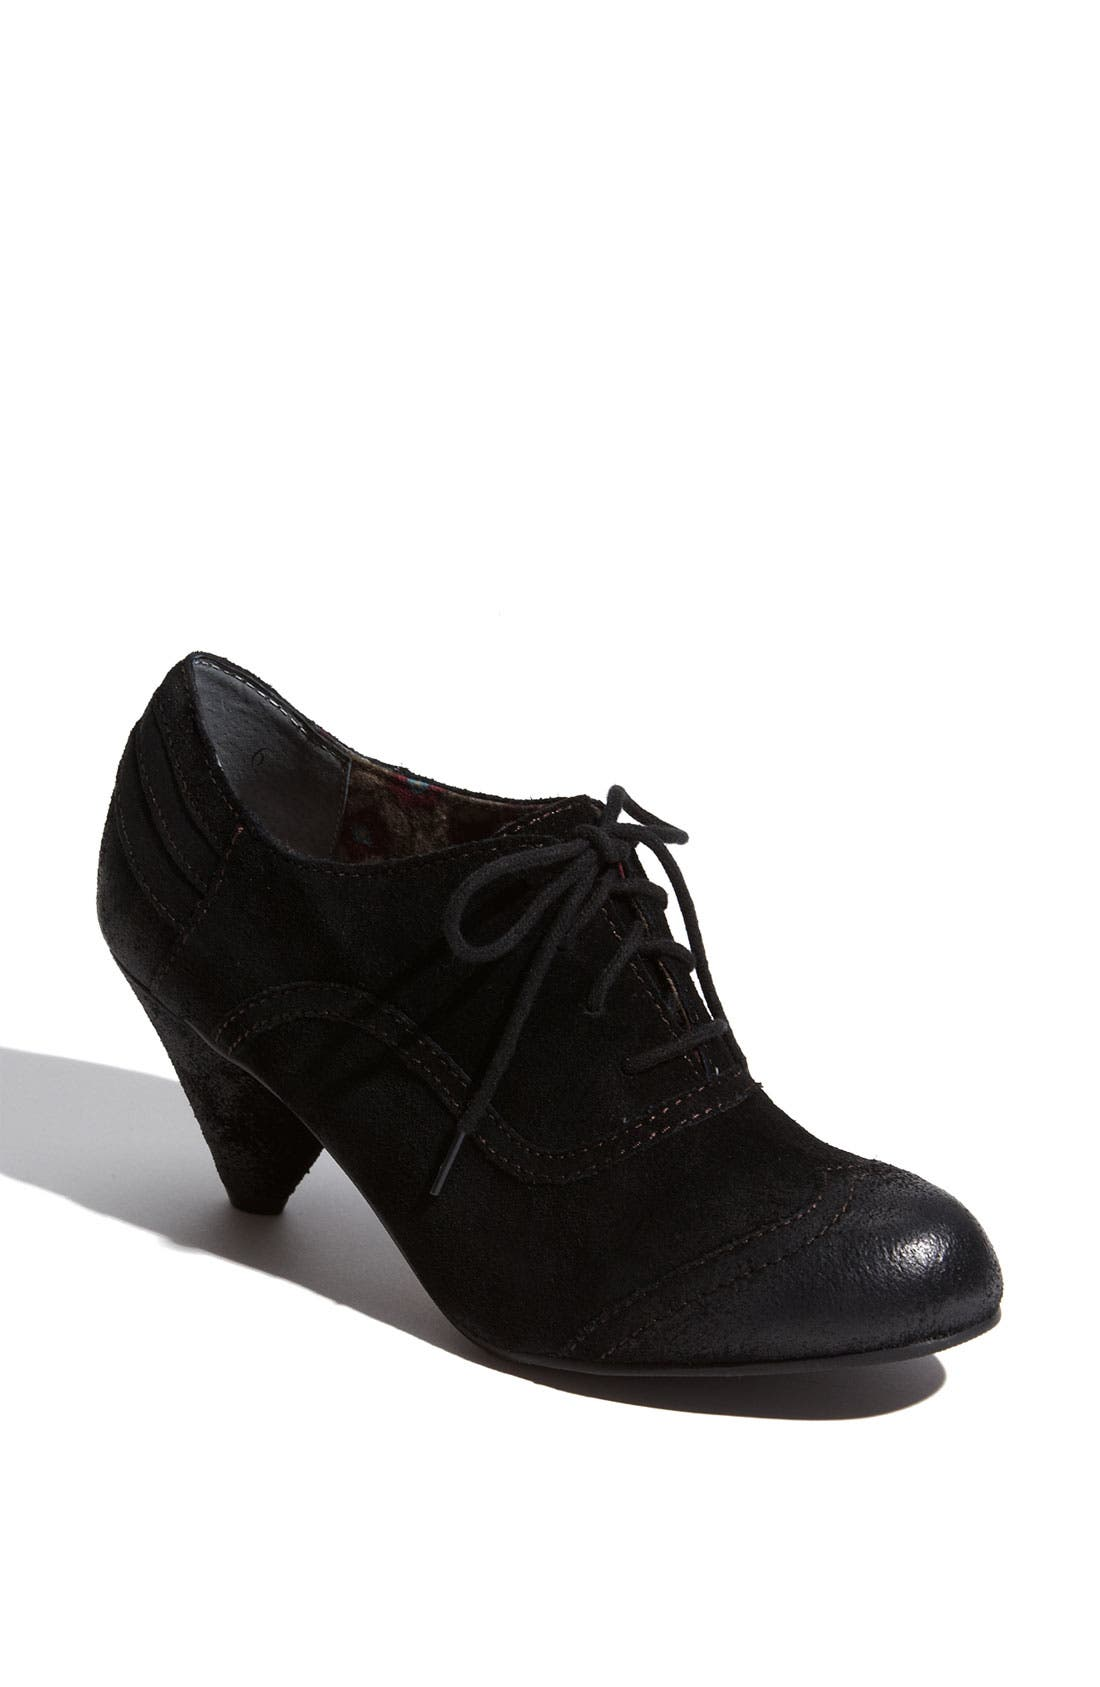 Alternate Image 1 Selected - BC Footwear 'Foil' Oxford Pump